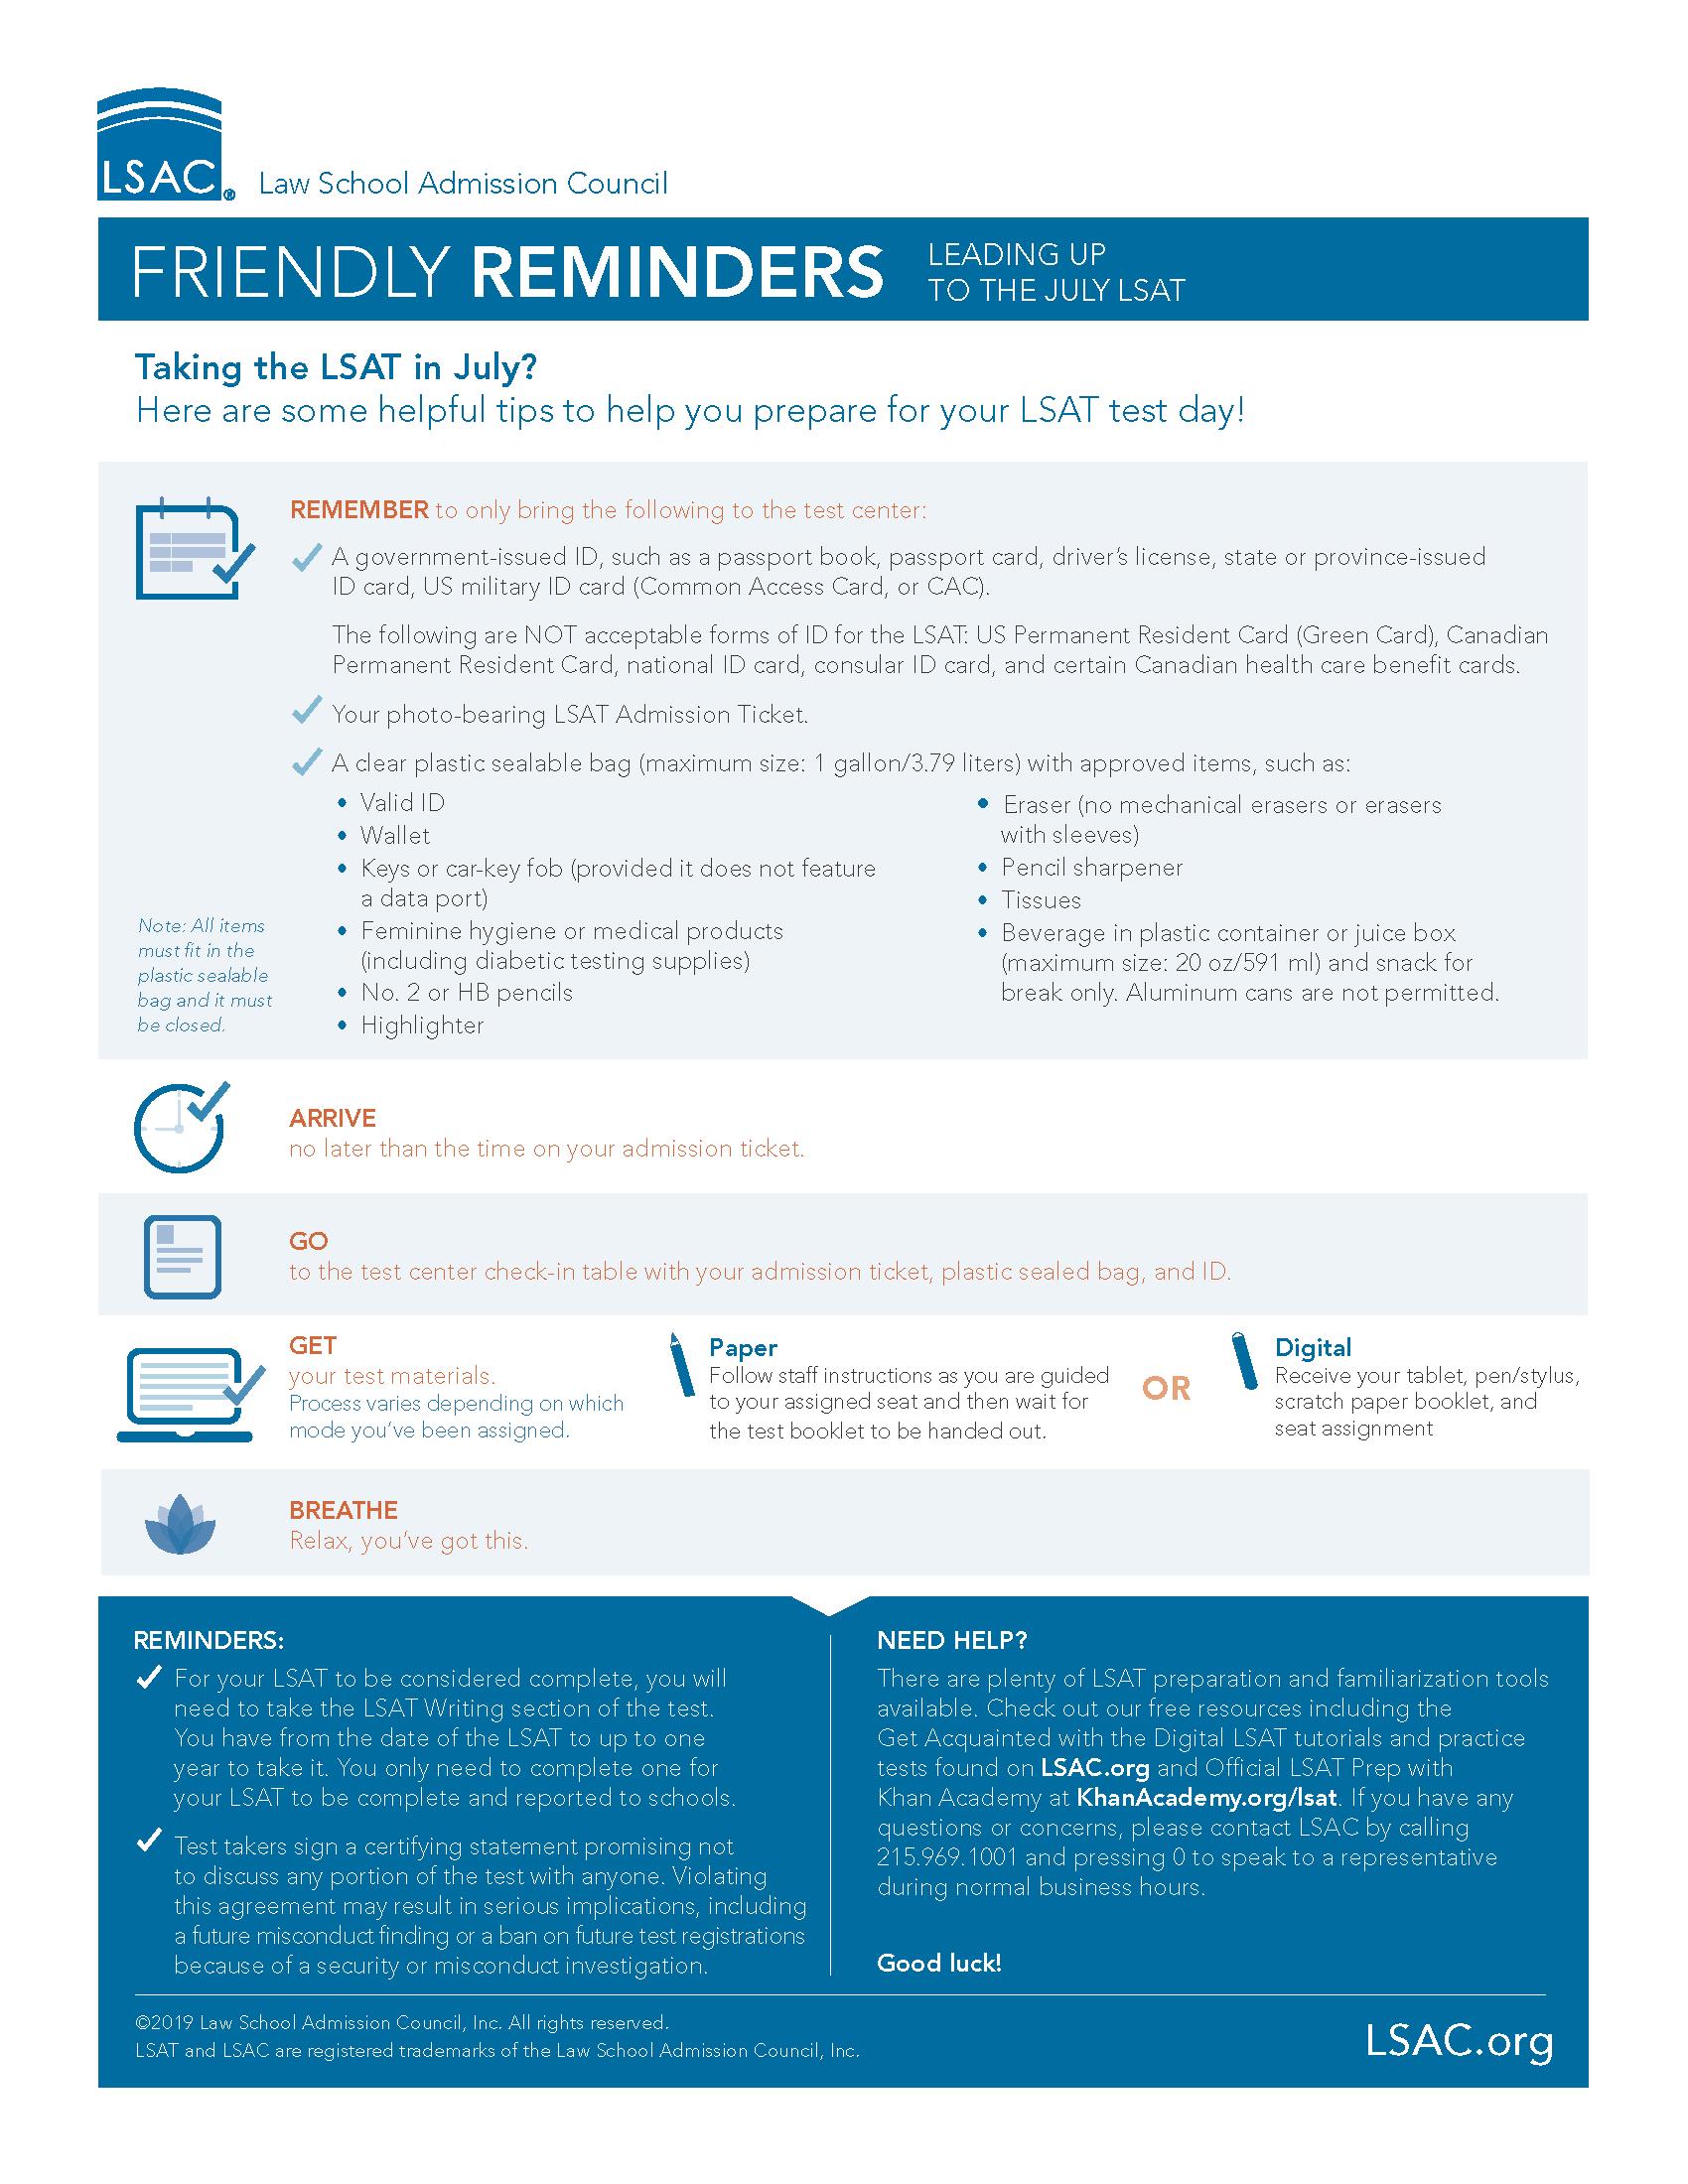 Pre-Law Advising Services Blog – Publishing pre-law news